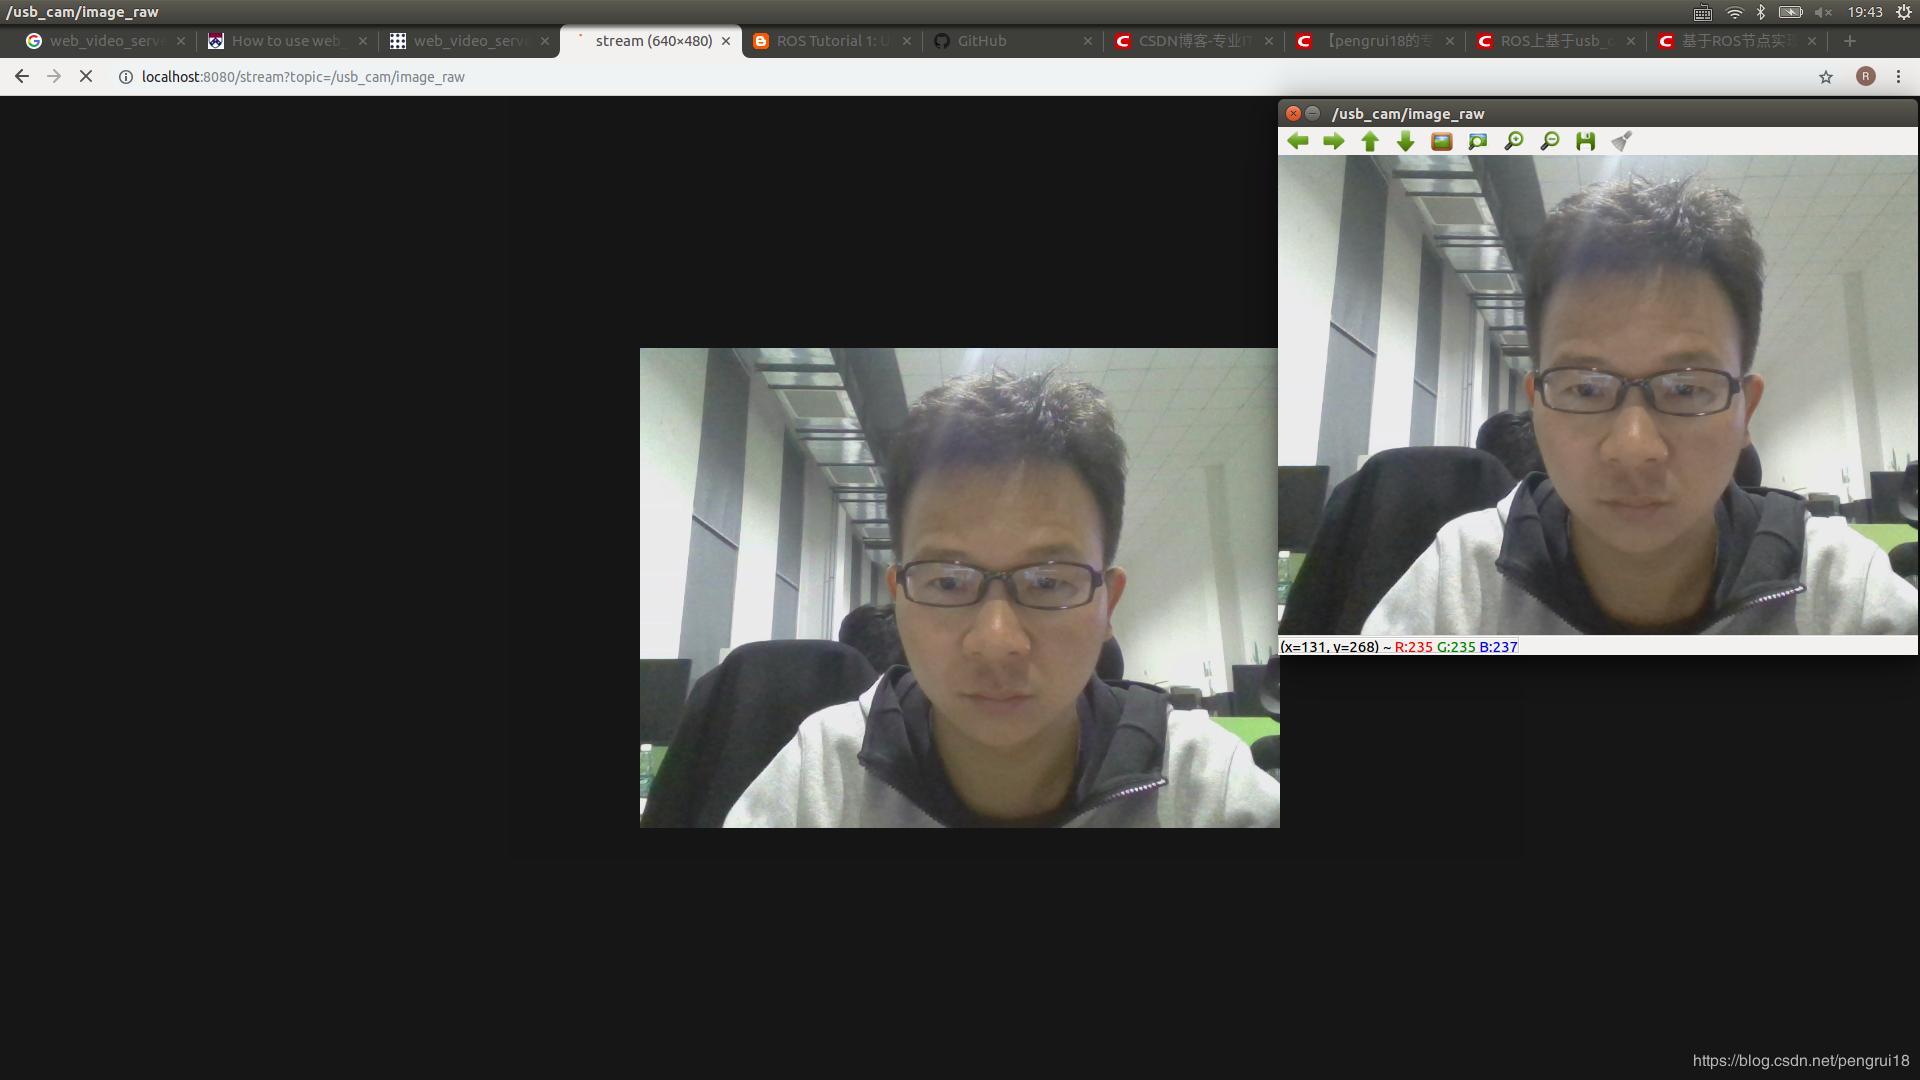 USB camera based on ROS node for web display - Programmer Sought